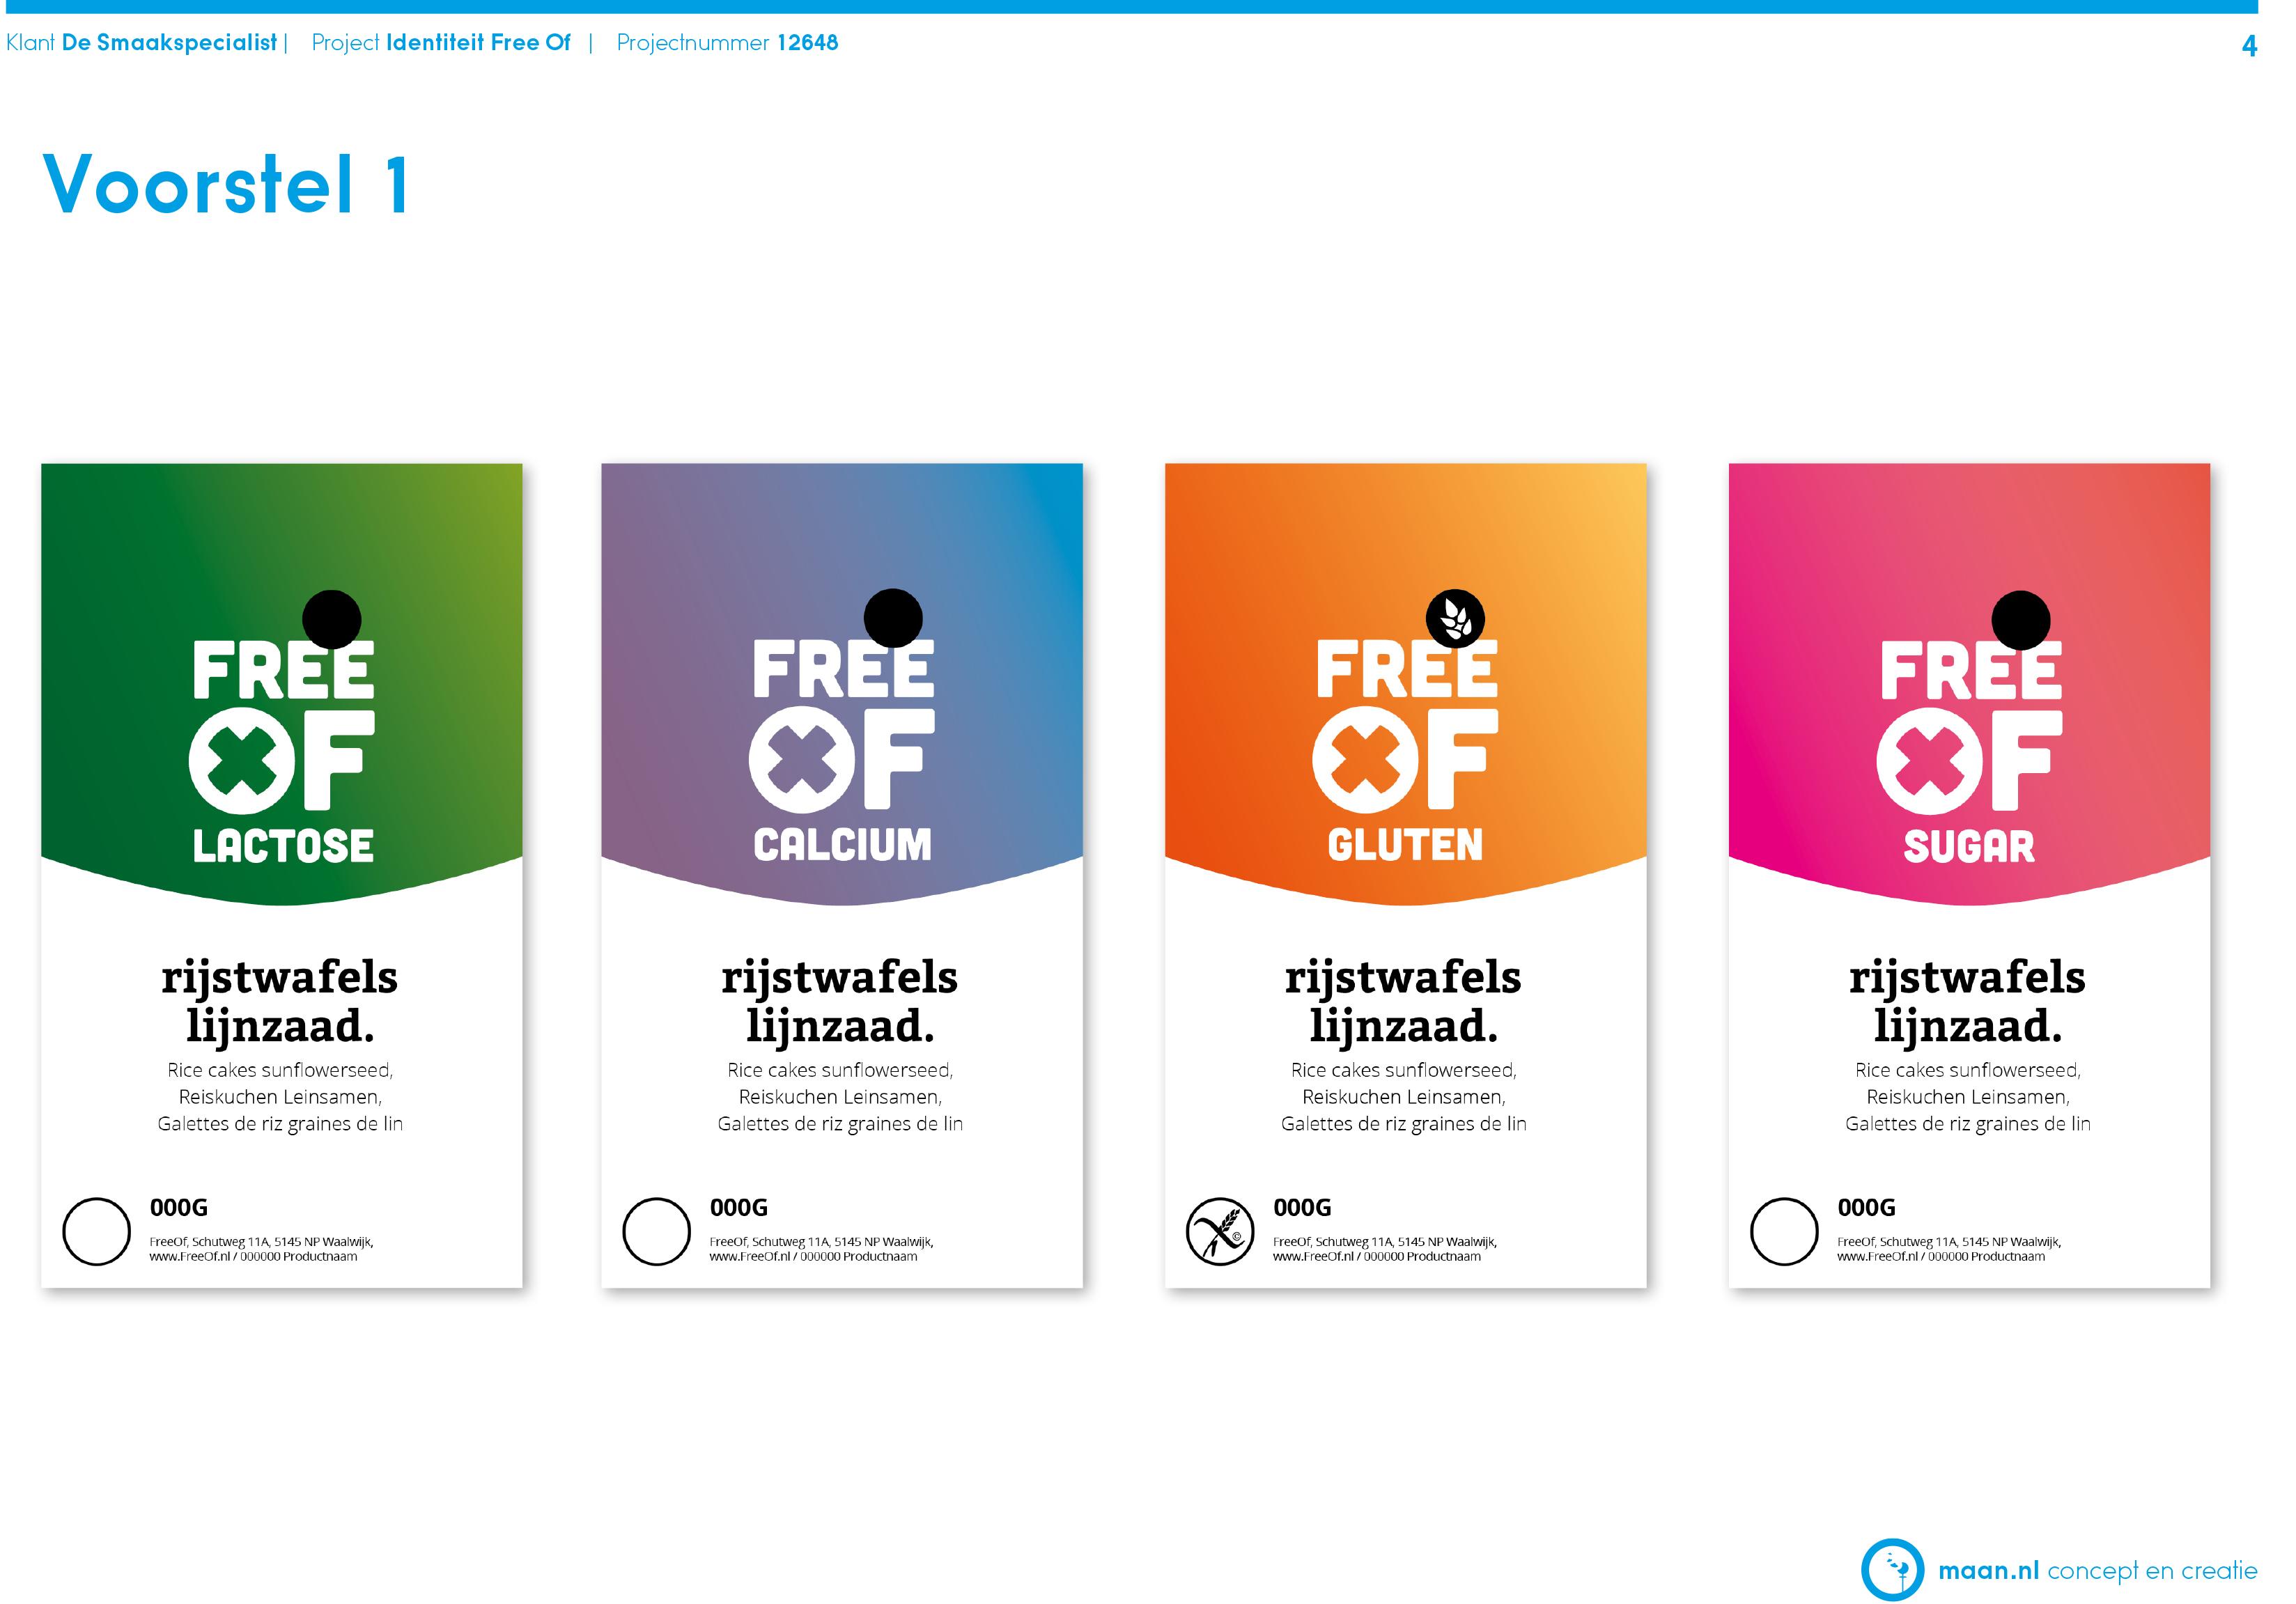 09-03-16-presentatie-concept-freeof-4